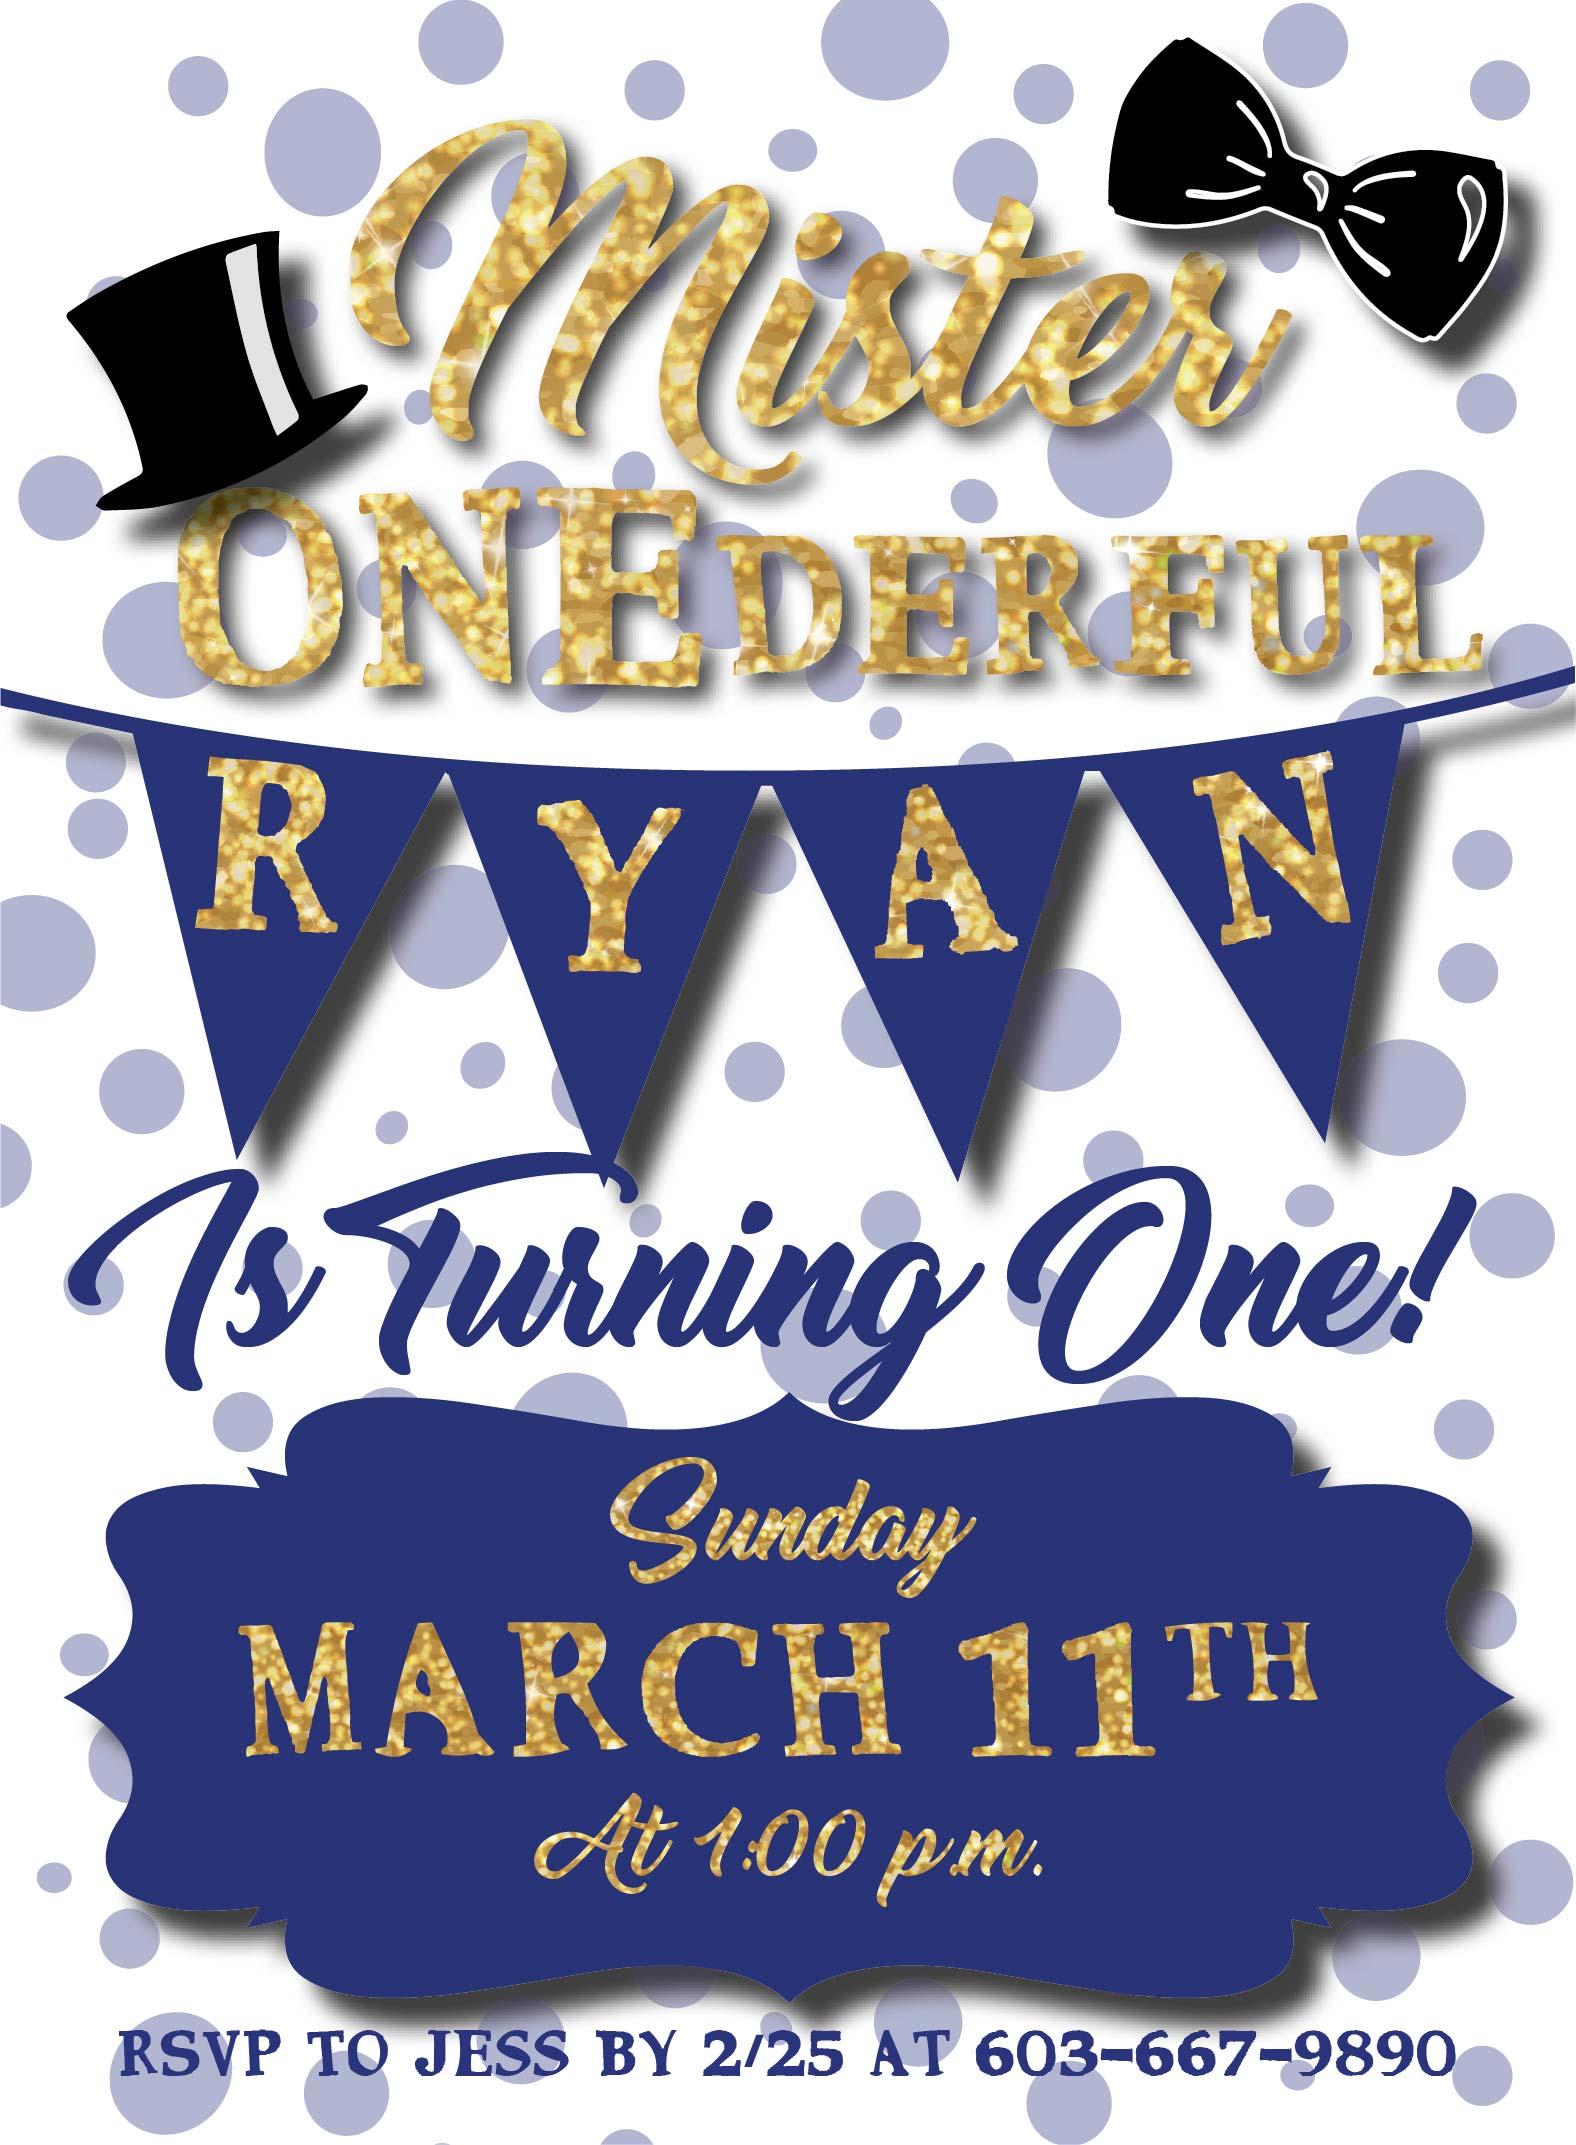 Mr. ONEderful Invitation